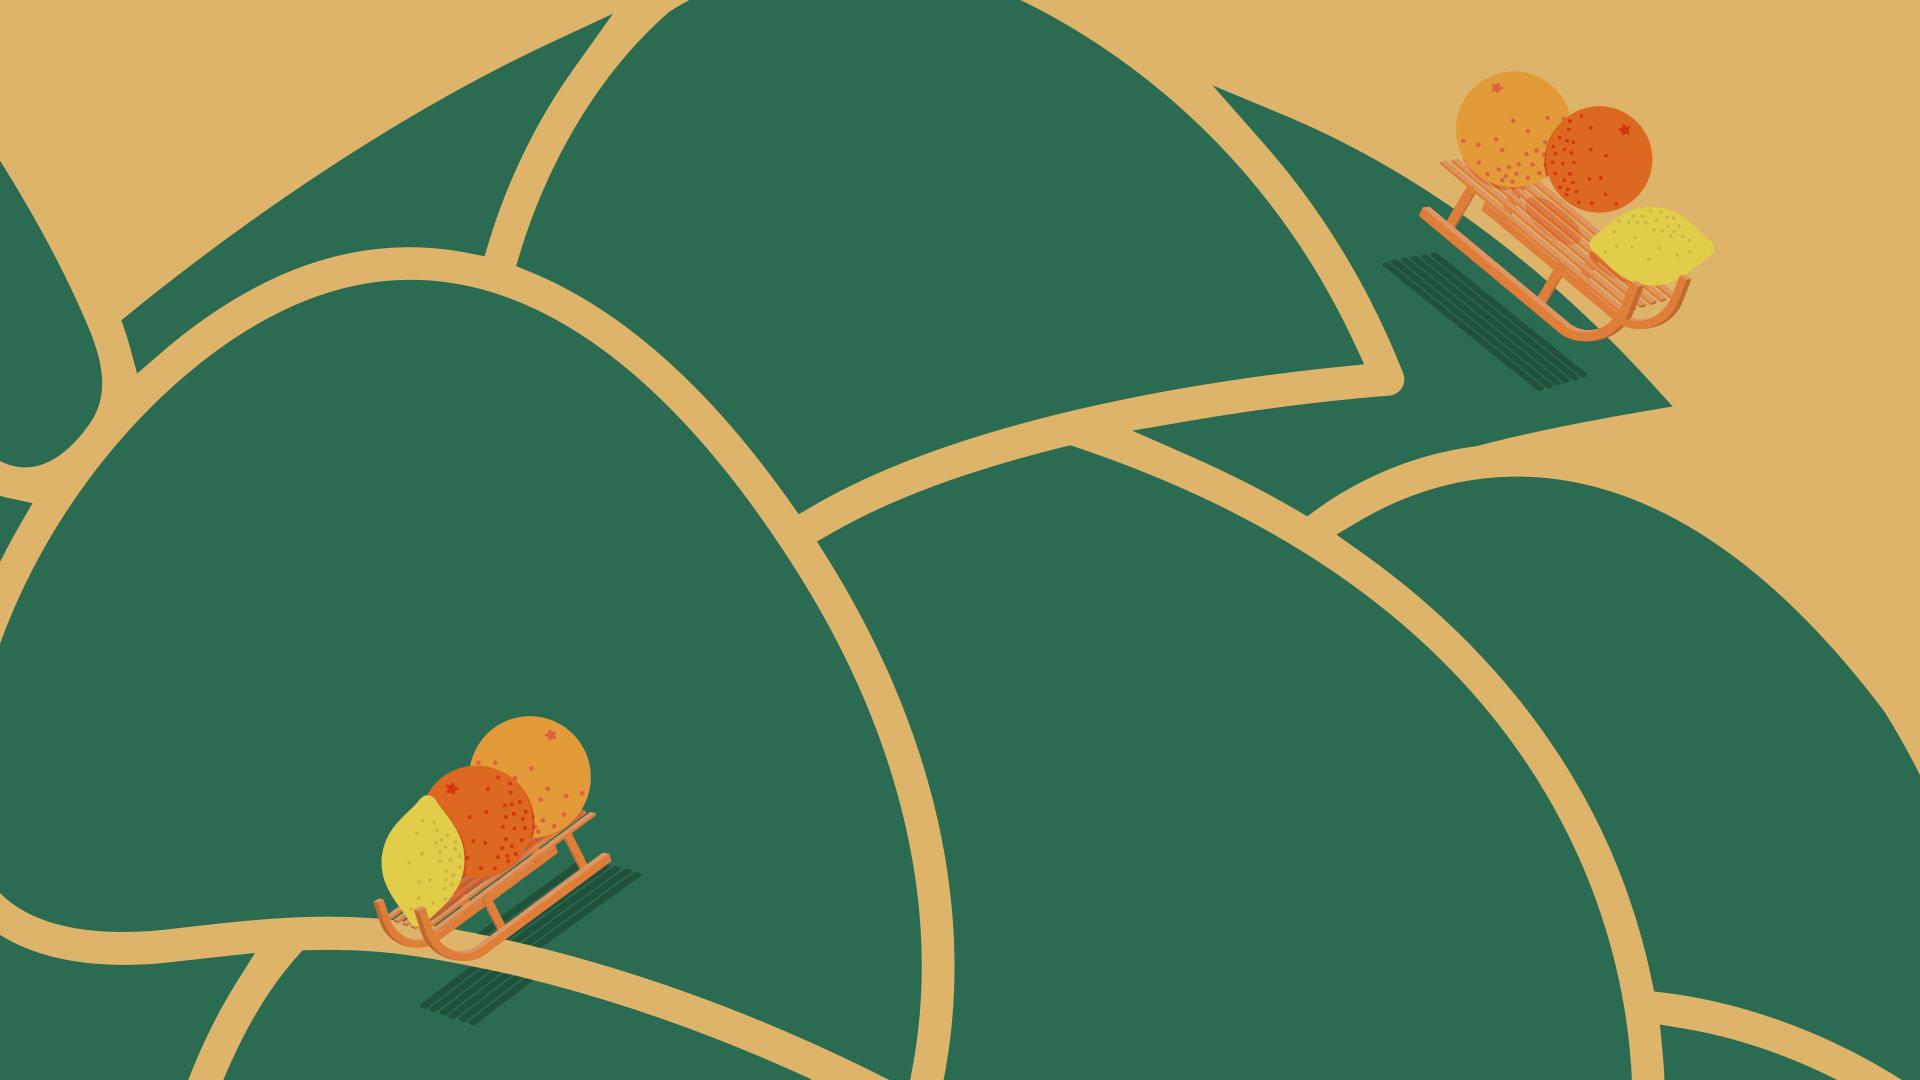 Double Descente Background